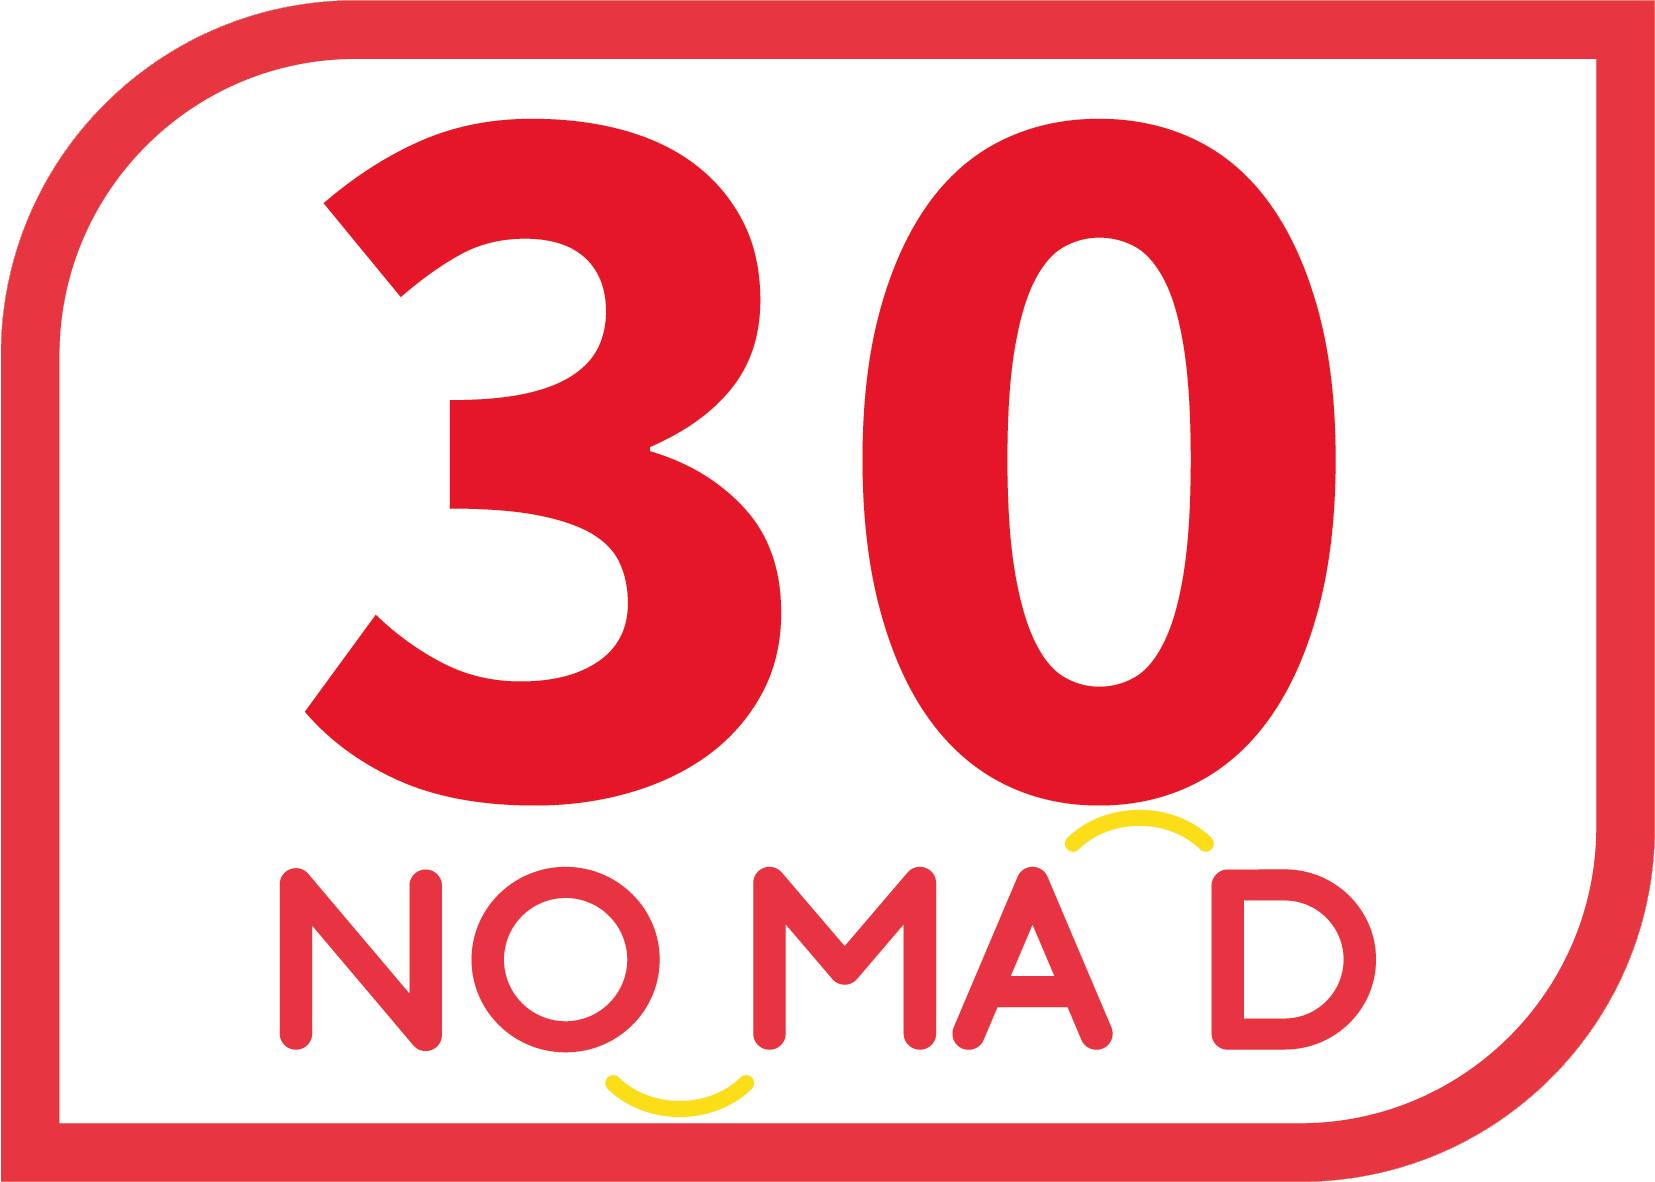 Ligne Nomad 30